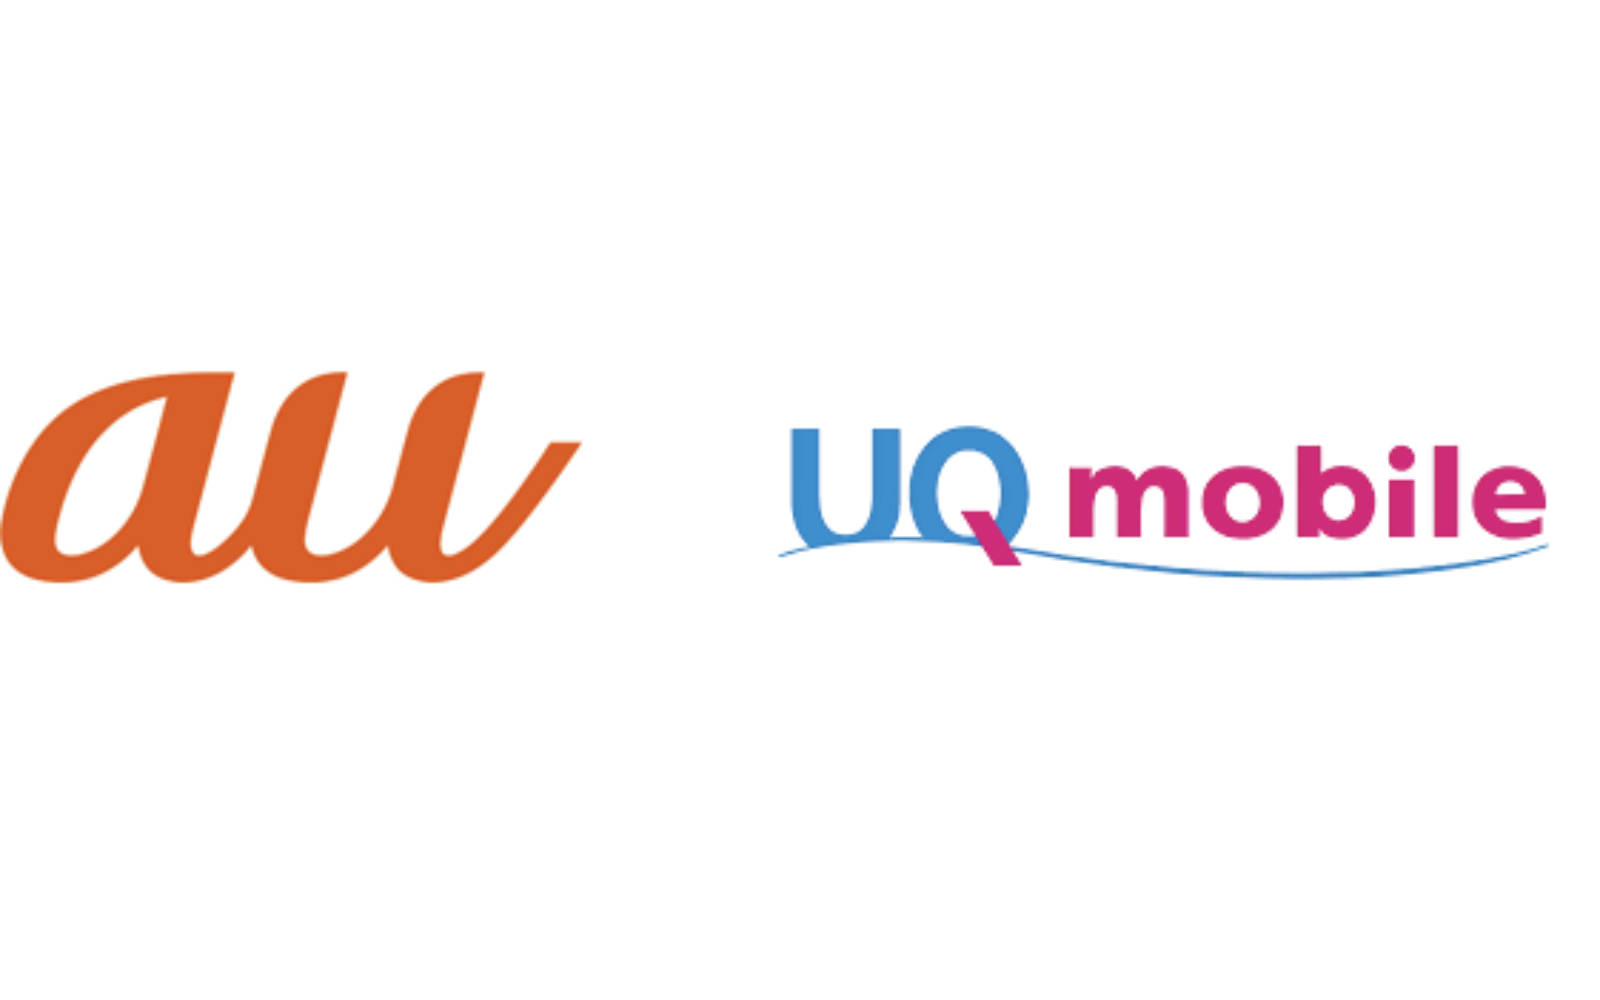 Au welcomes uqmobile